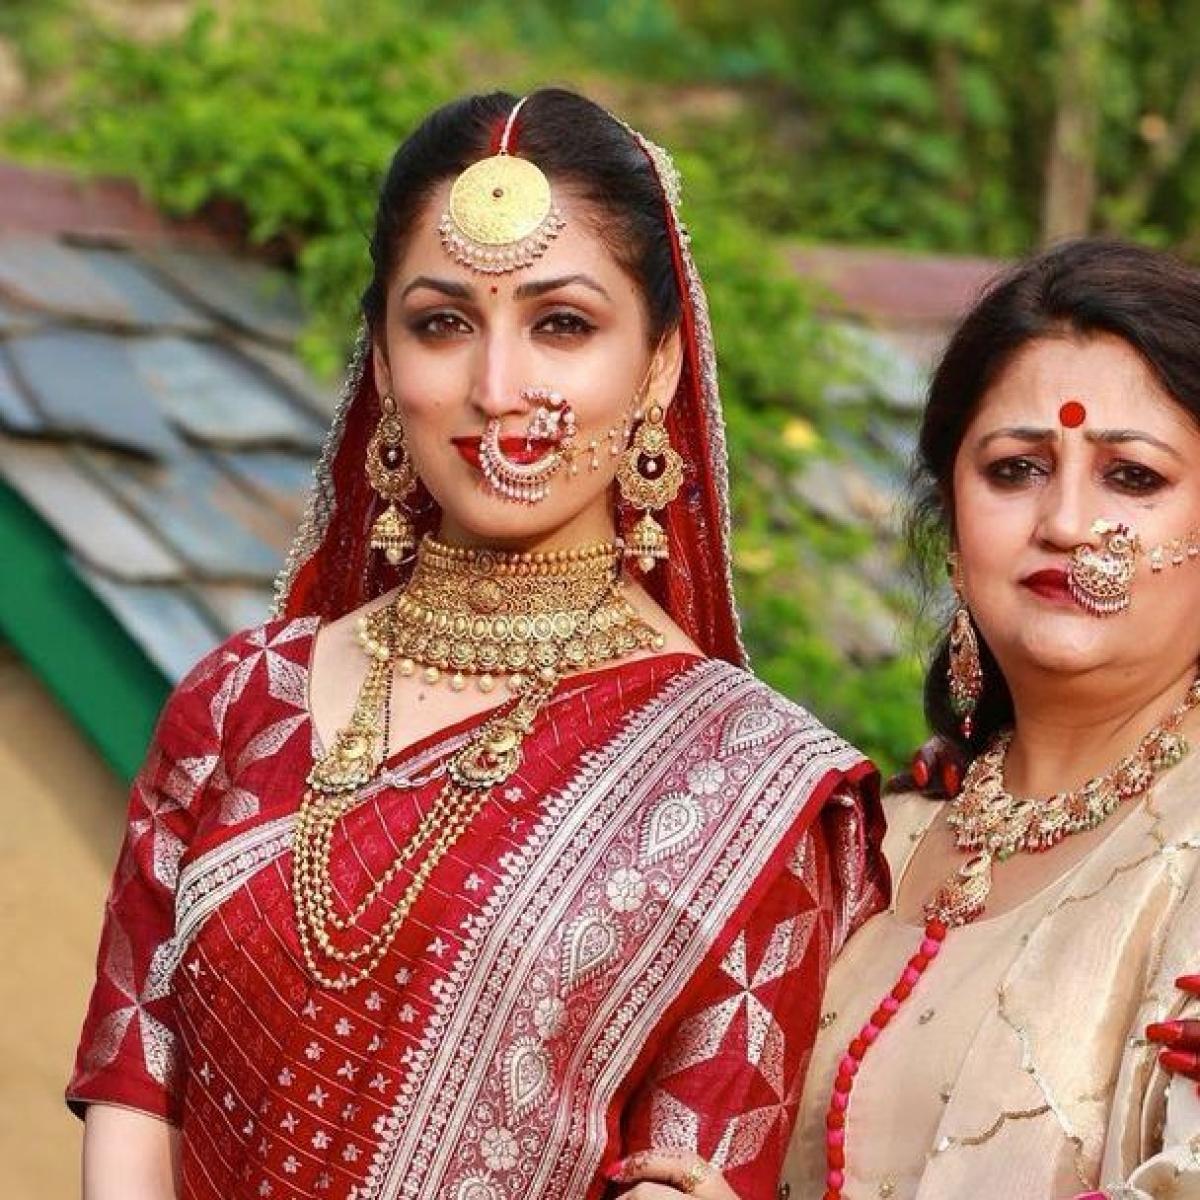 Newlywed Yami Gautam shares an unseen wedding photo on her mom's birthday with a heartfelt caption